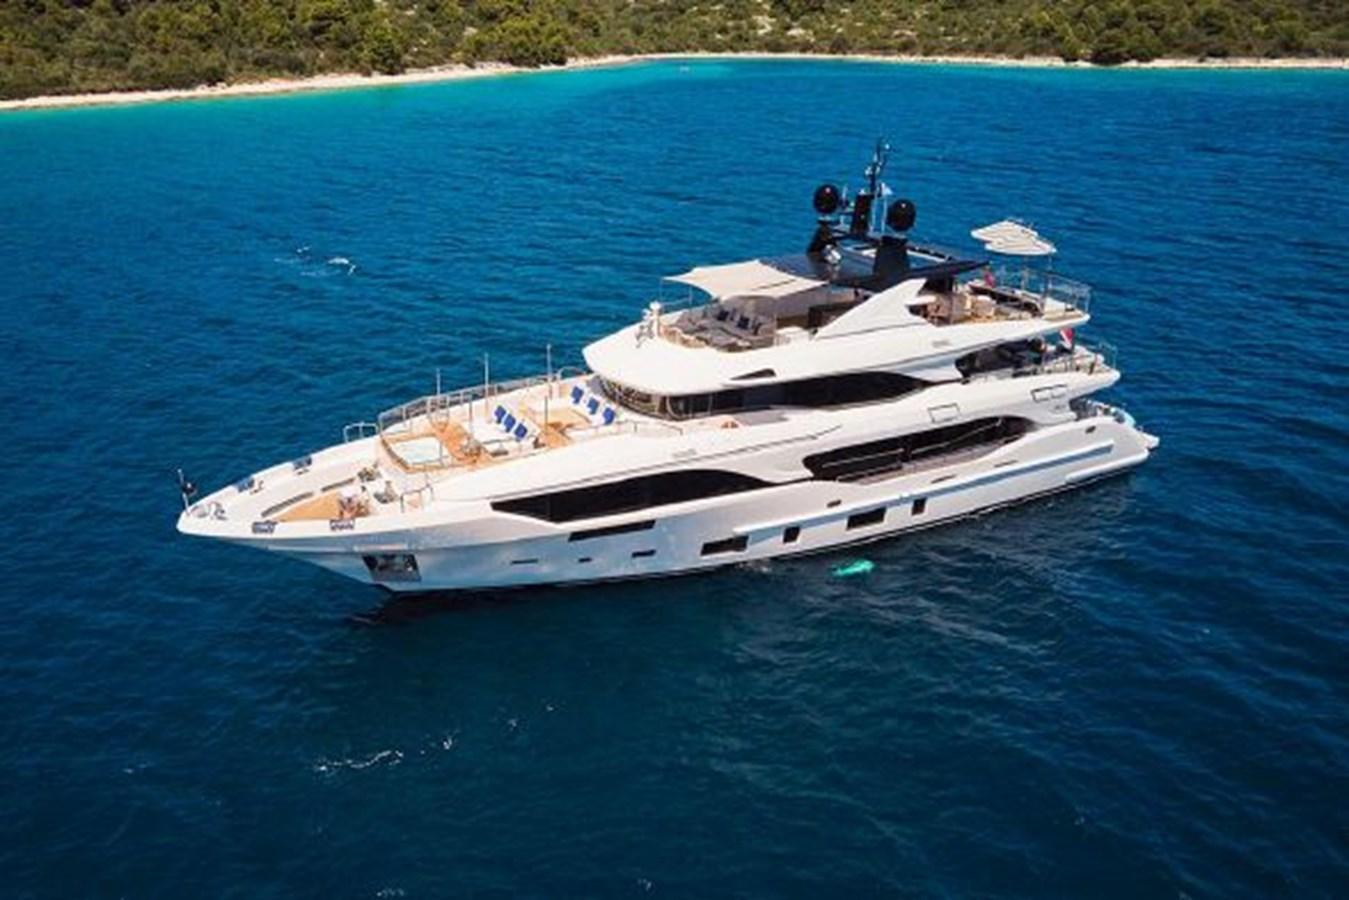 2018 Benetti Mediterraneo 116 – Virgin Islands yacht for sale